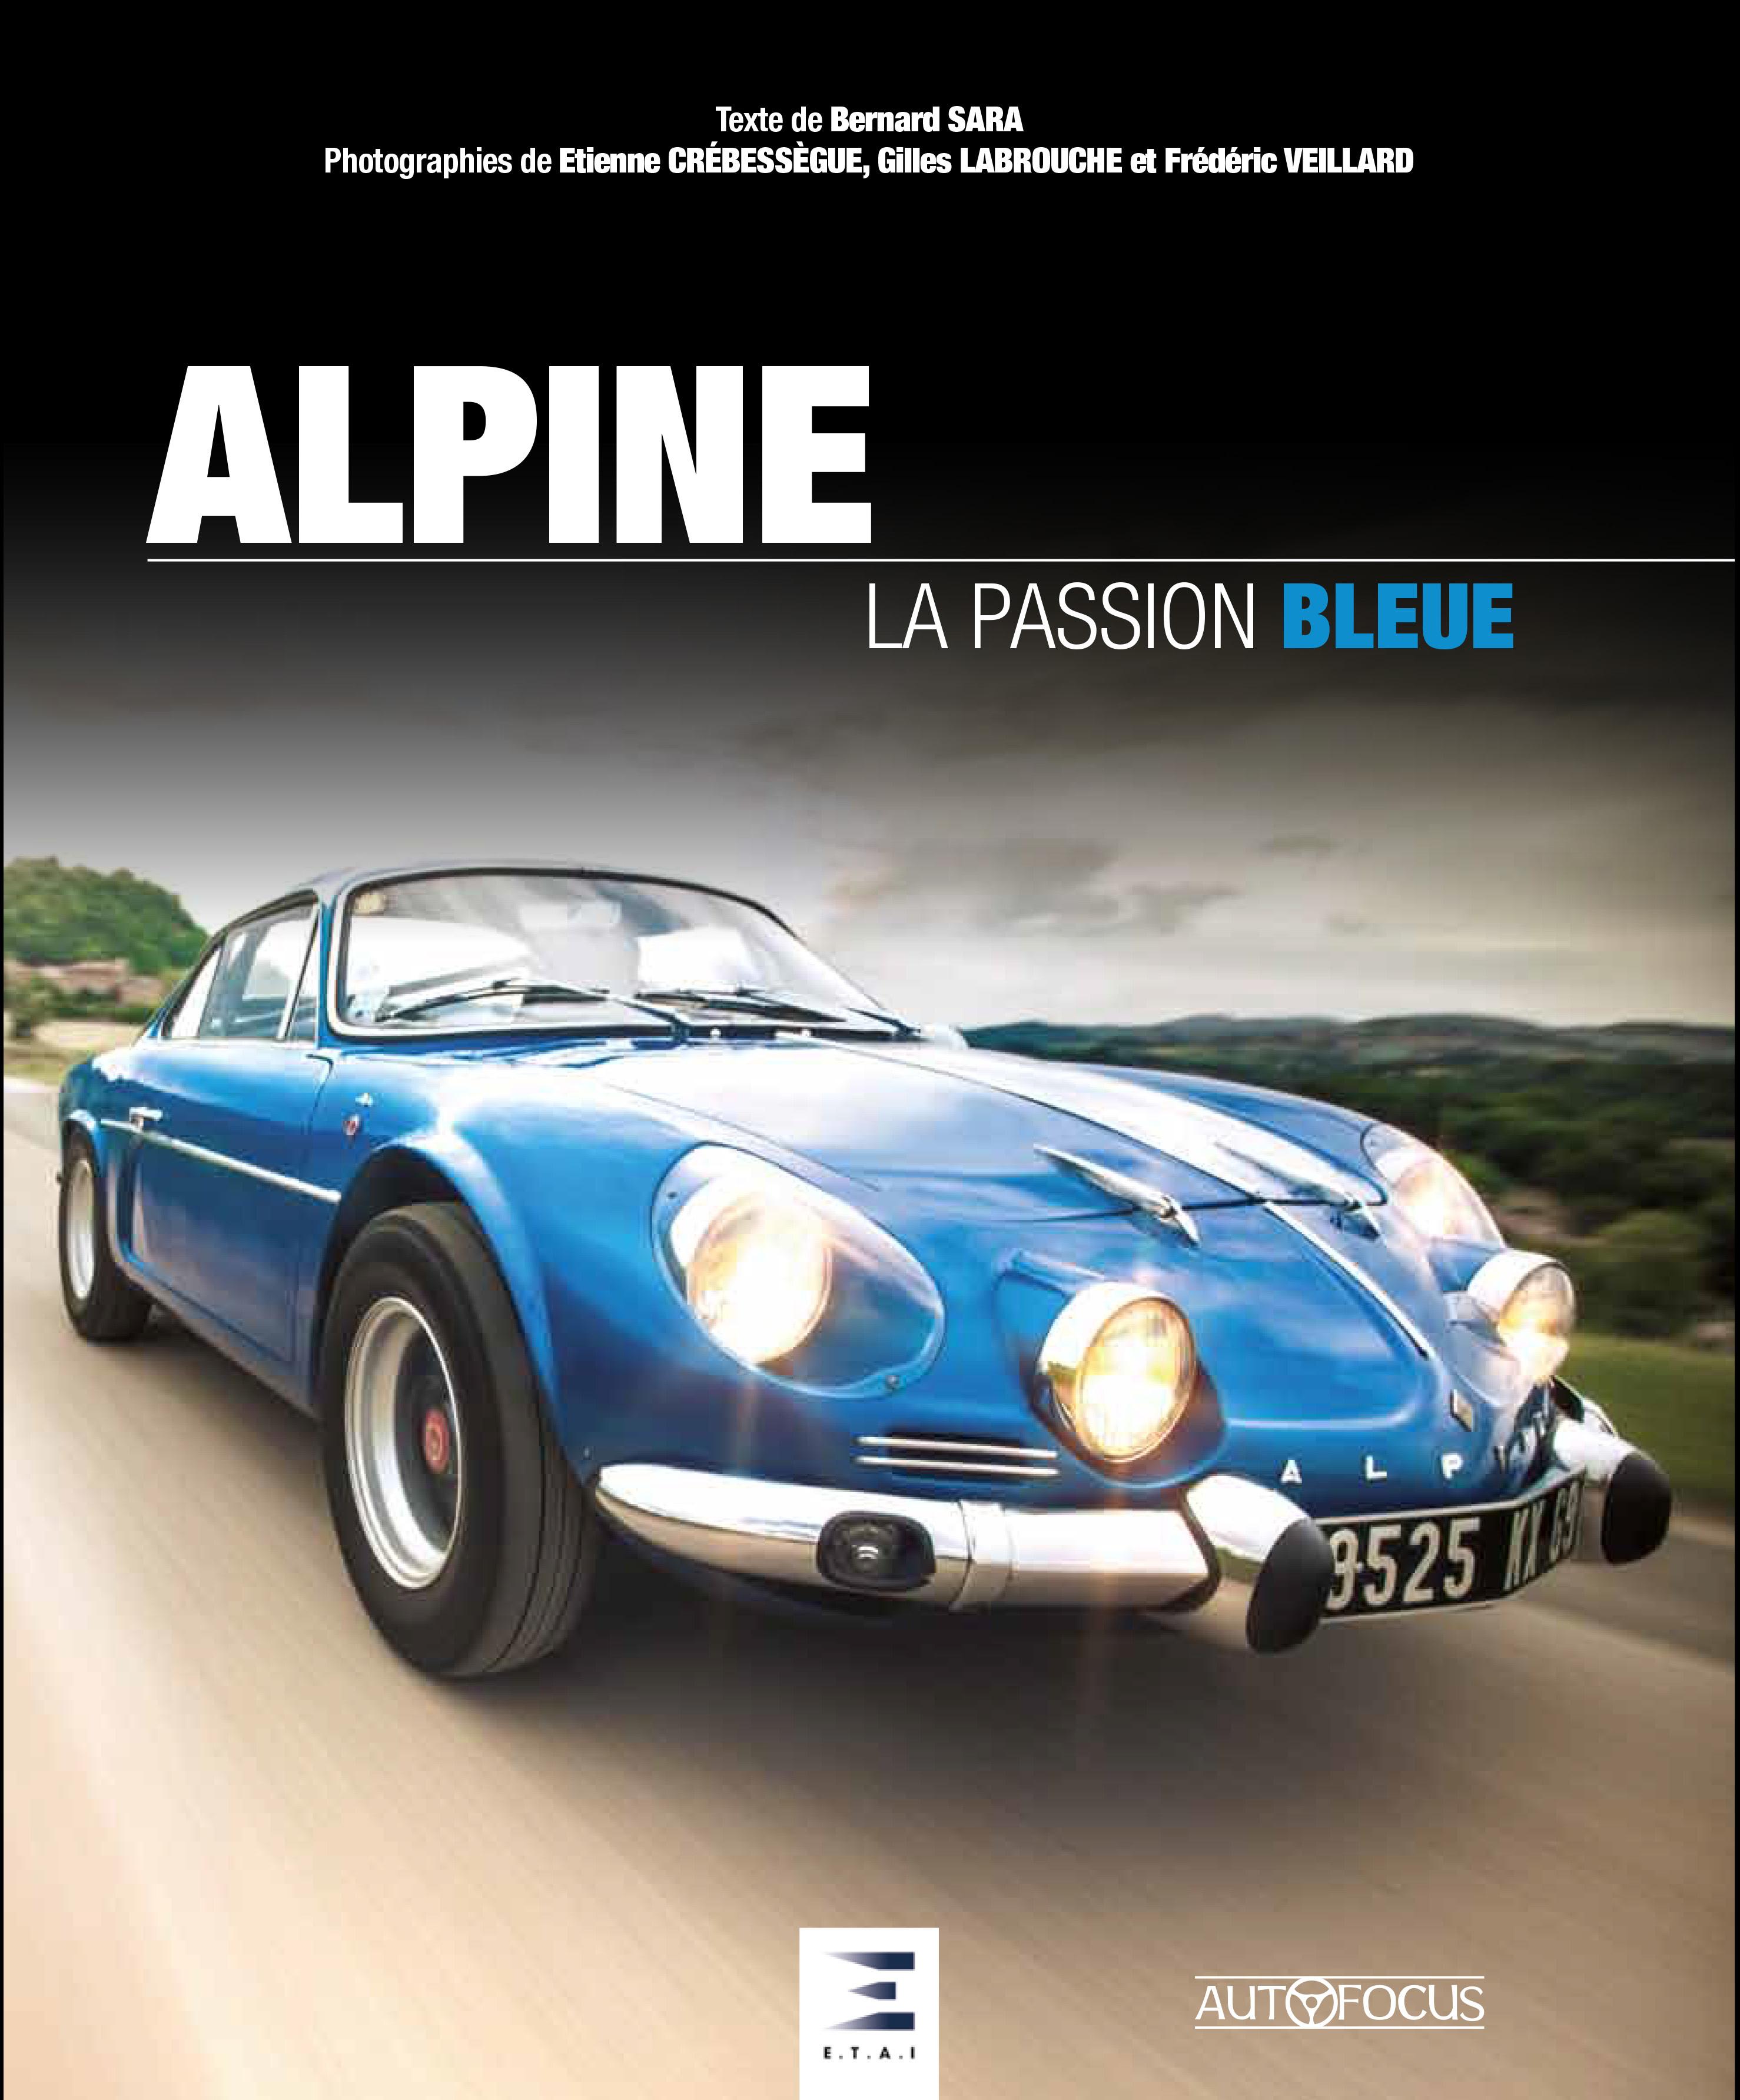 ALPINE, LA PASSION BLEUE